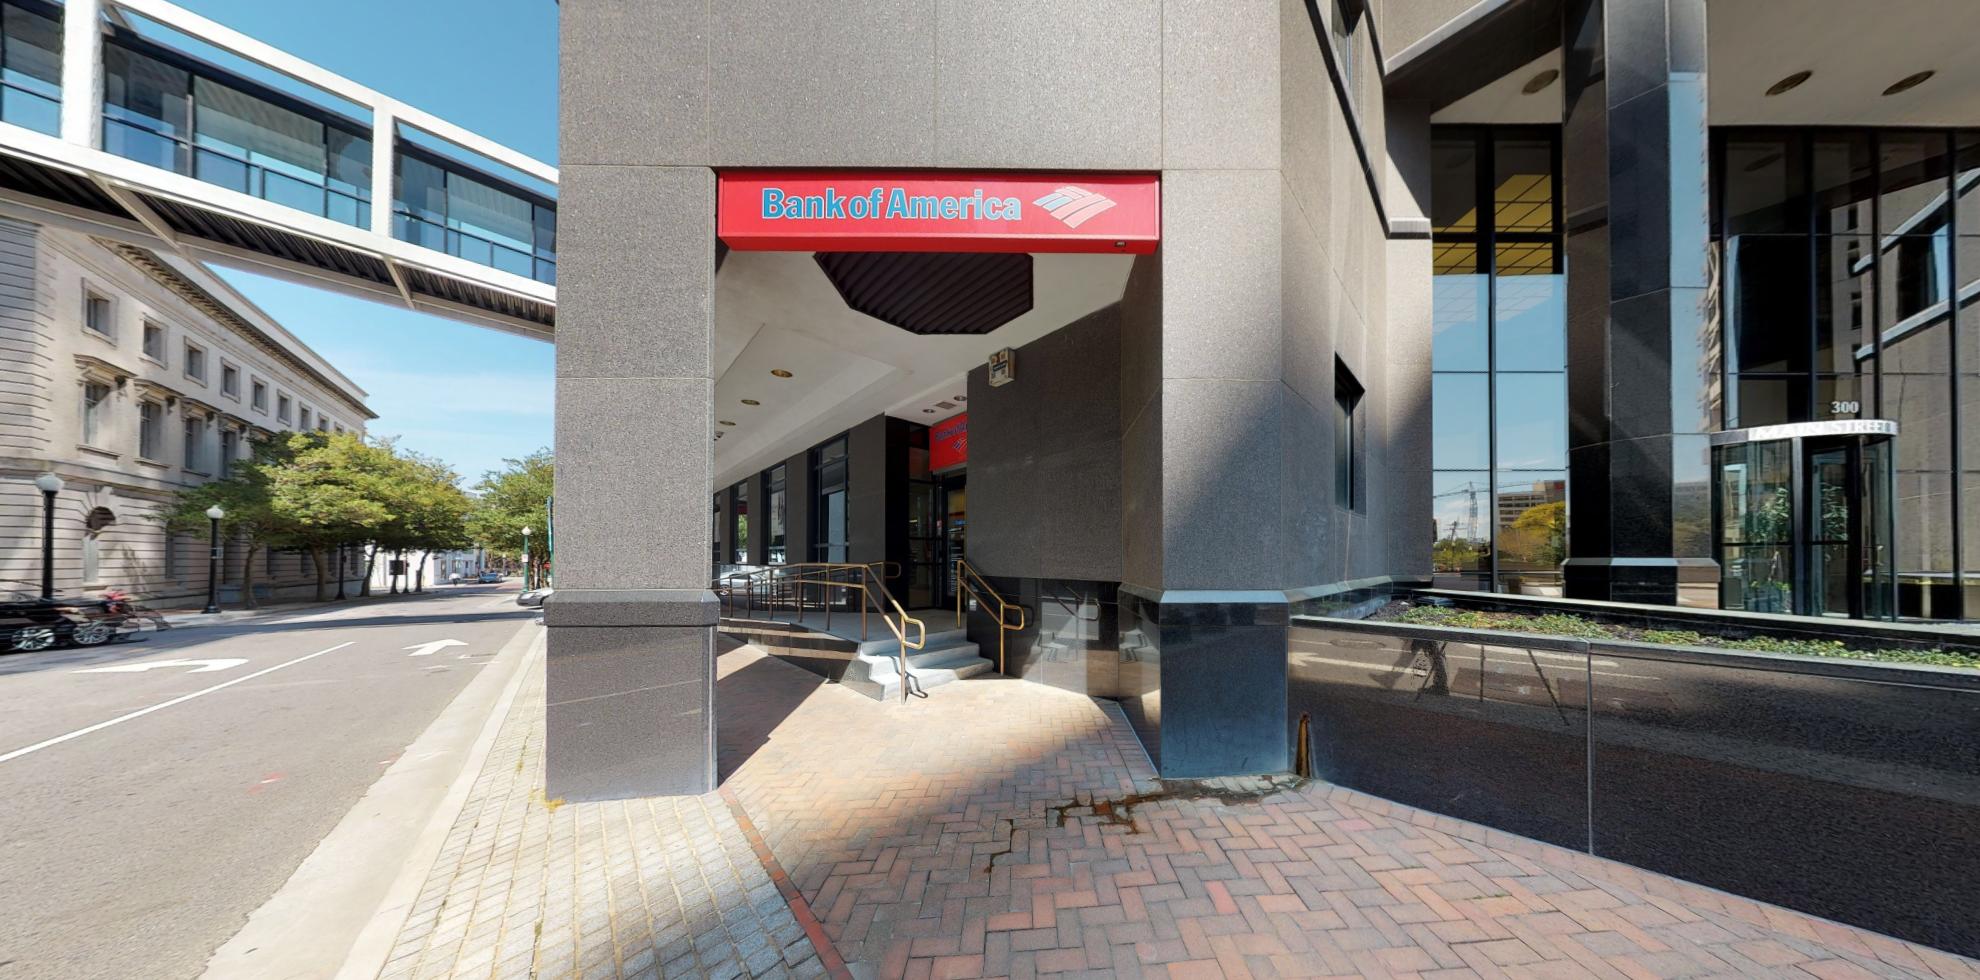 Bank of America financial center with drive-thru ATM   300 E Main St, Norfolk, VA 23510